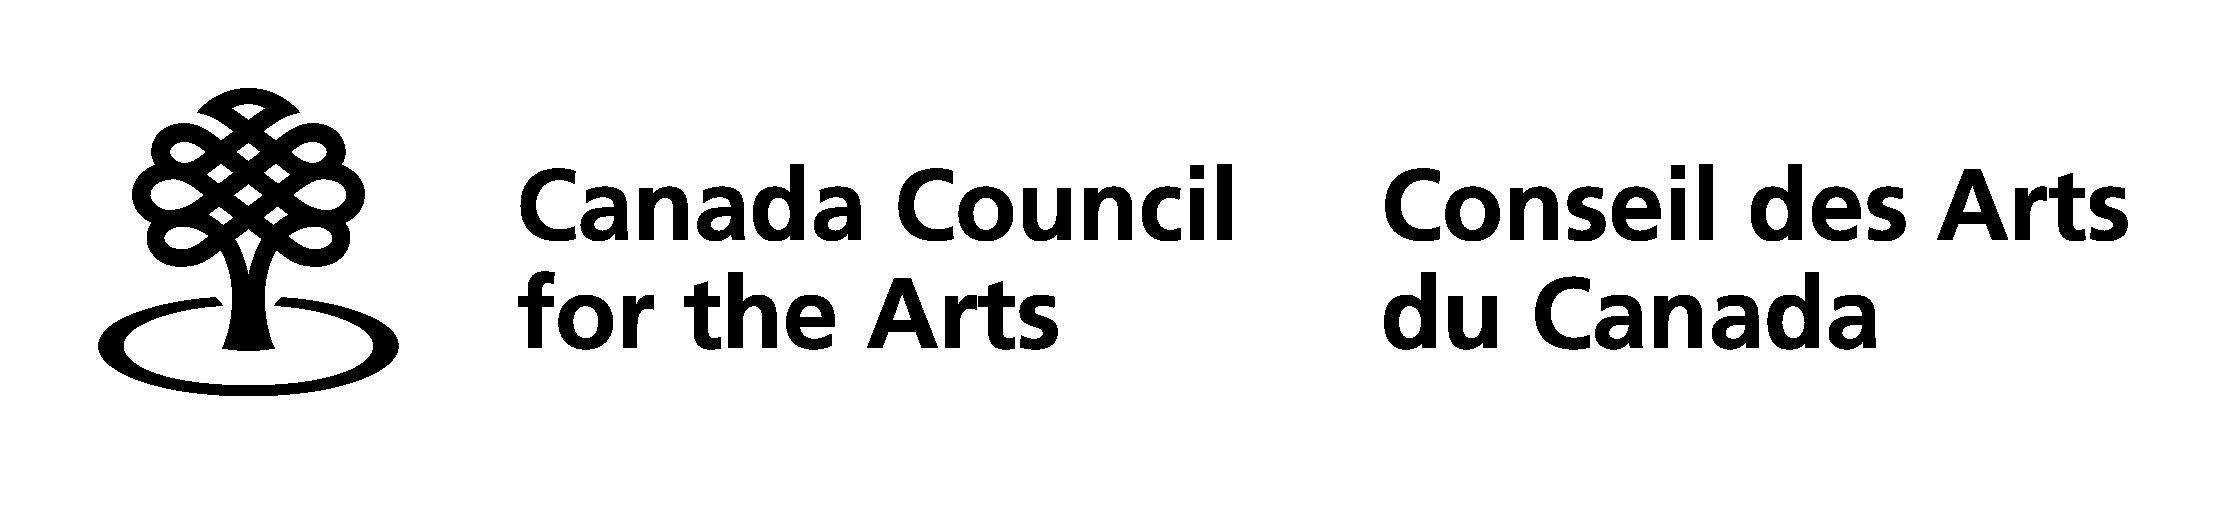 canada_council_logo_e_l.jpg